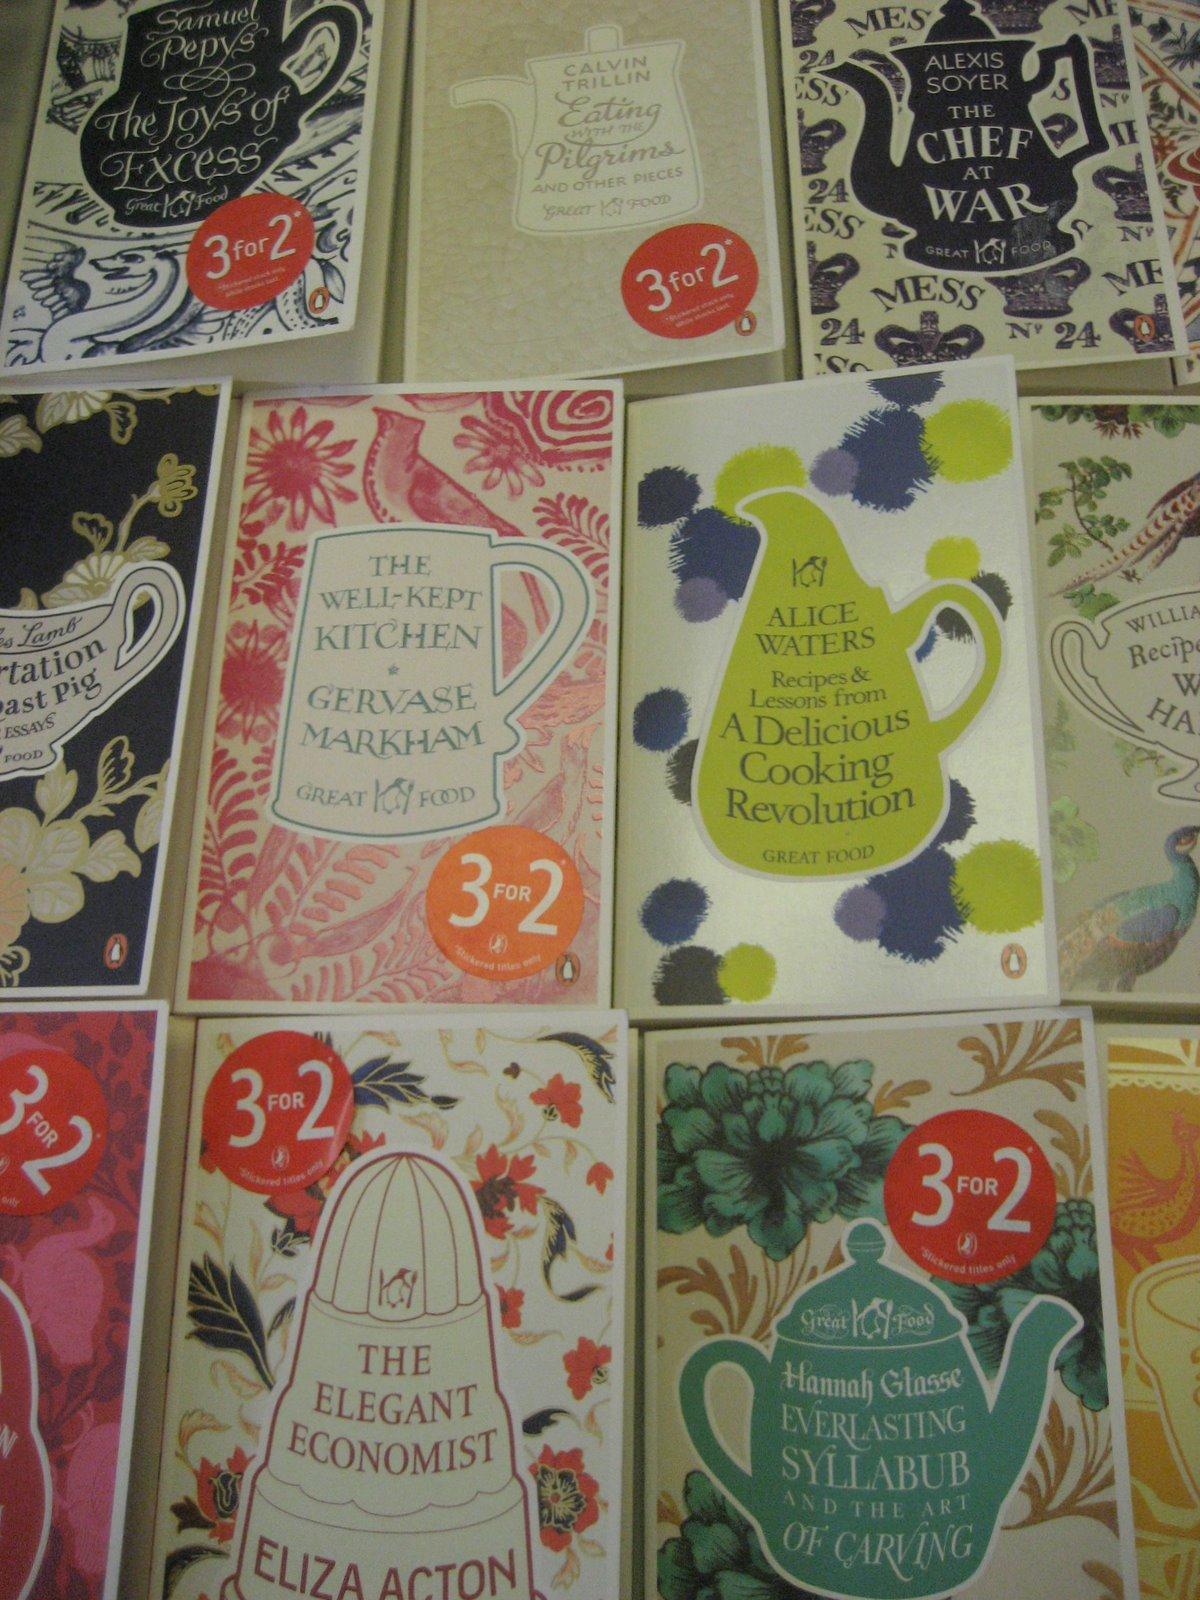 Book Cover Design Handmade : Handmade happiness book cover design